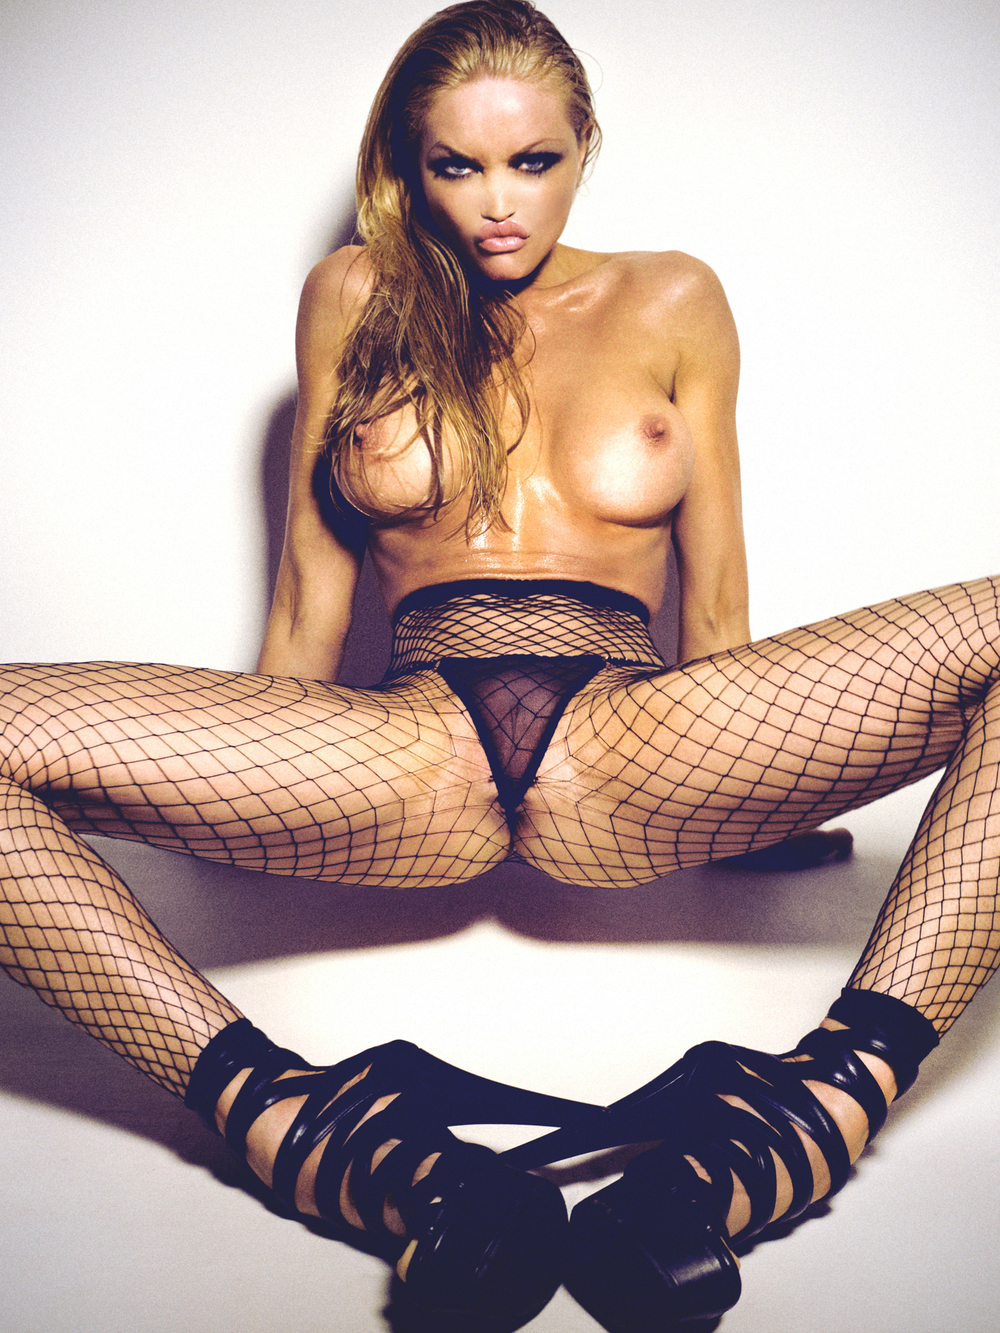 Nude erotic photo art of jan saudek 2 4